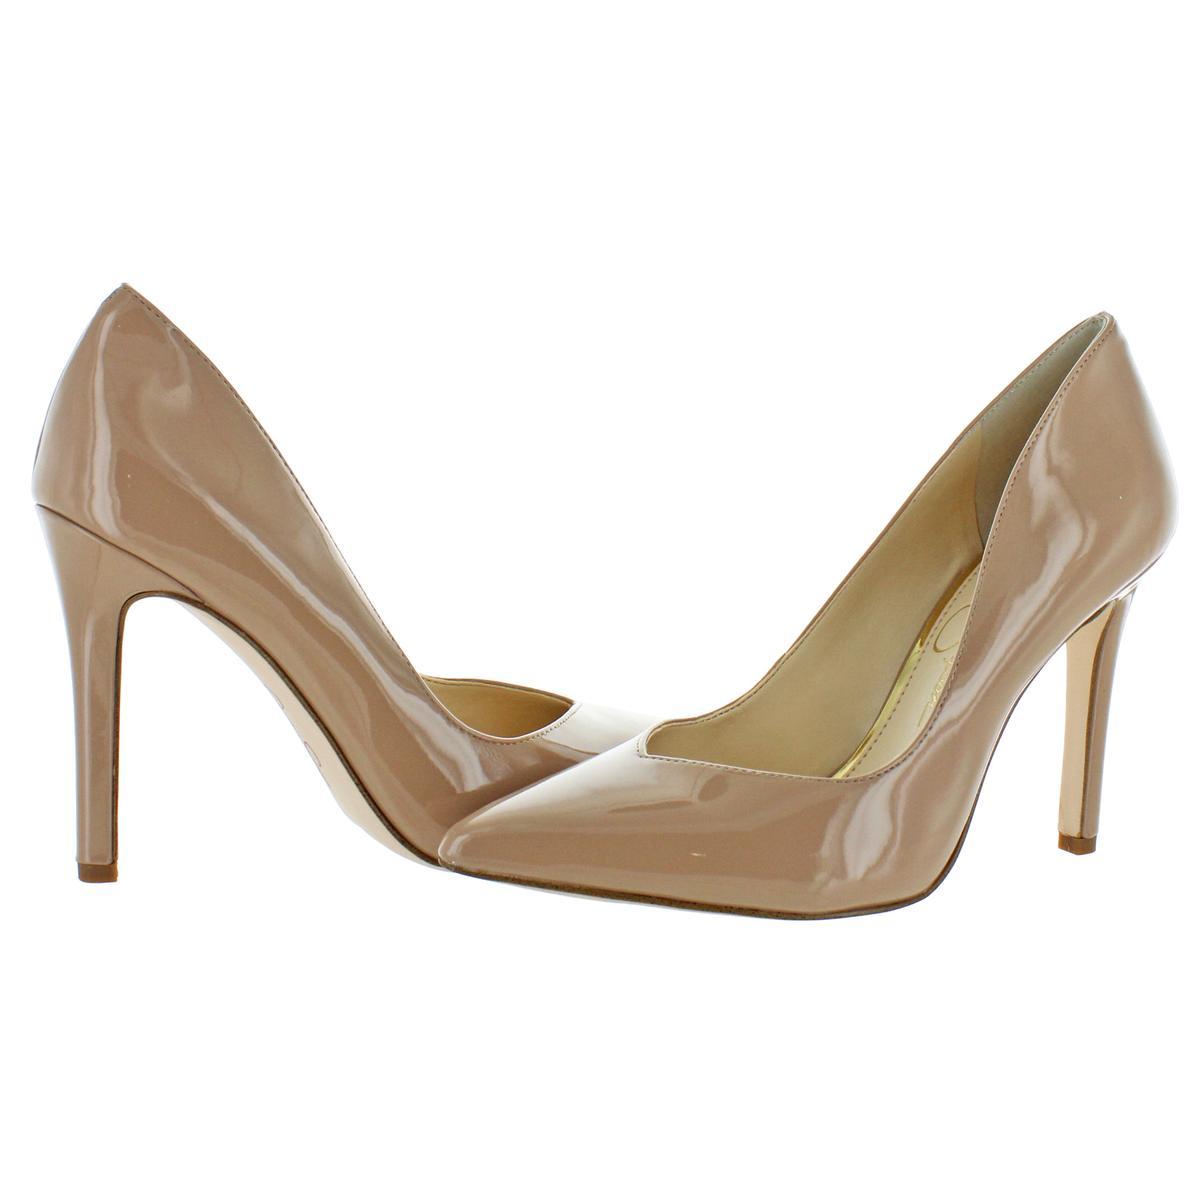 Jessica-Simpson-Women-039-s-Cylvie-Metallic-V-Cut-Classic-Pumps-Heels-Shoes thumbnail 8